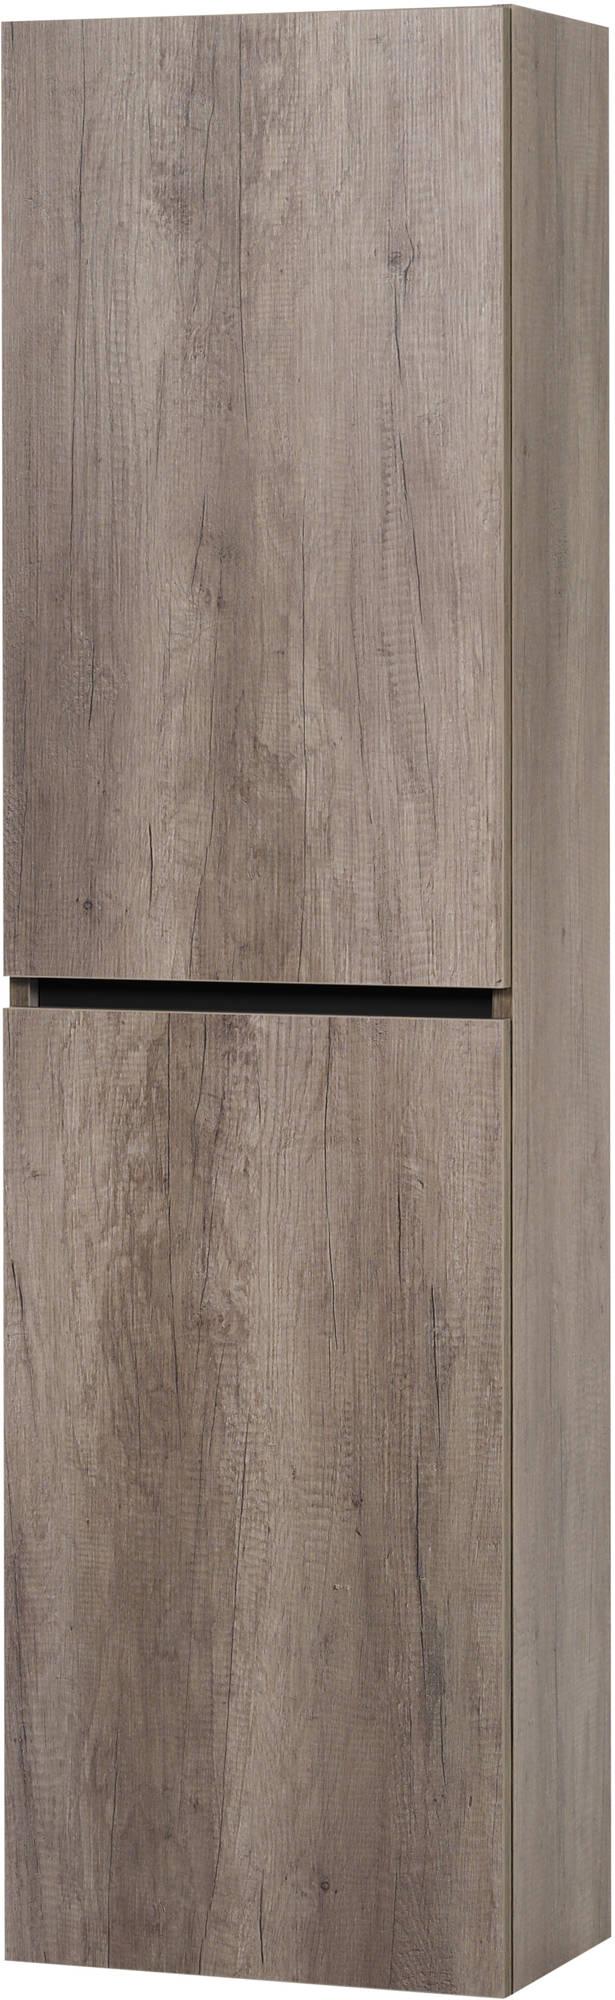 Ben Limara Hoge kast Links, 45x29x165 cm, Nebraska Eiken/Mat Zwart